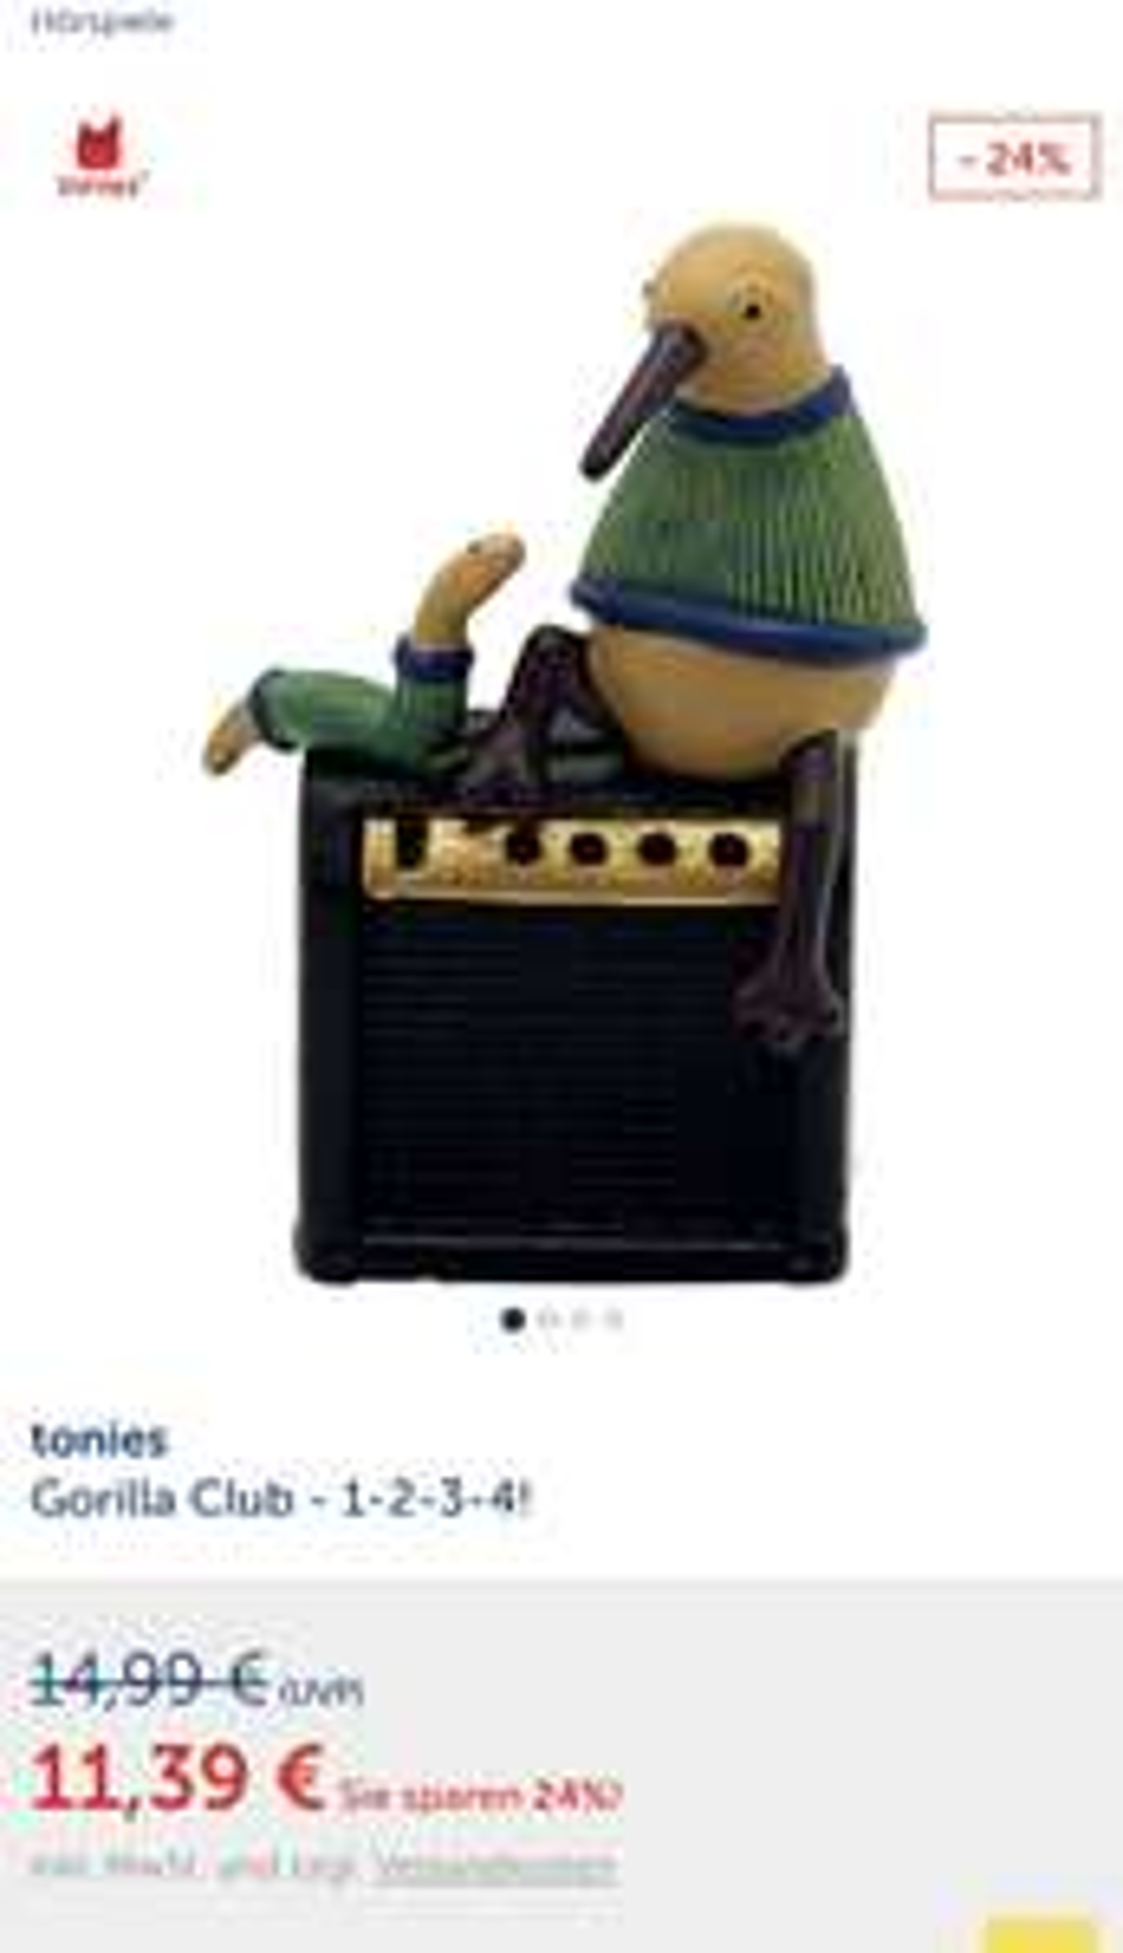 Tonies Gorilla Club 1-2-3-4 Tonie Musik Hörfigur für Toniebox